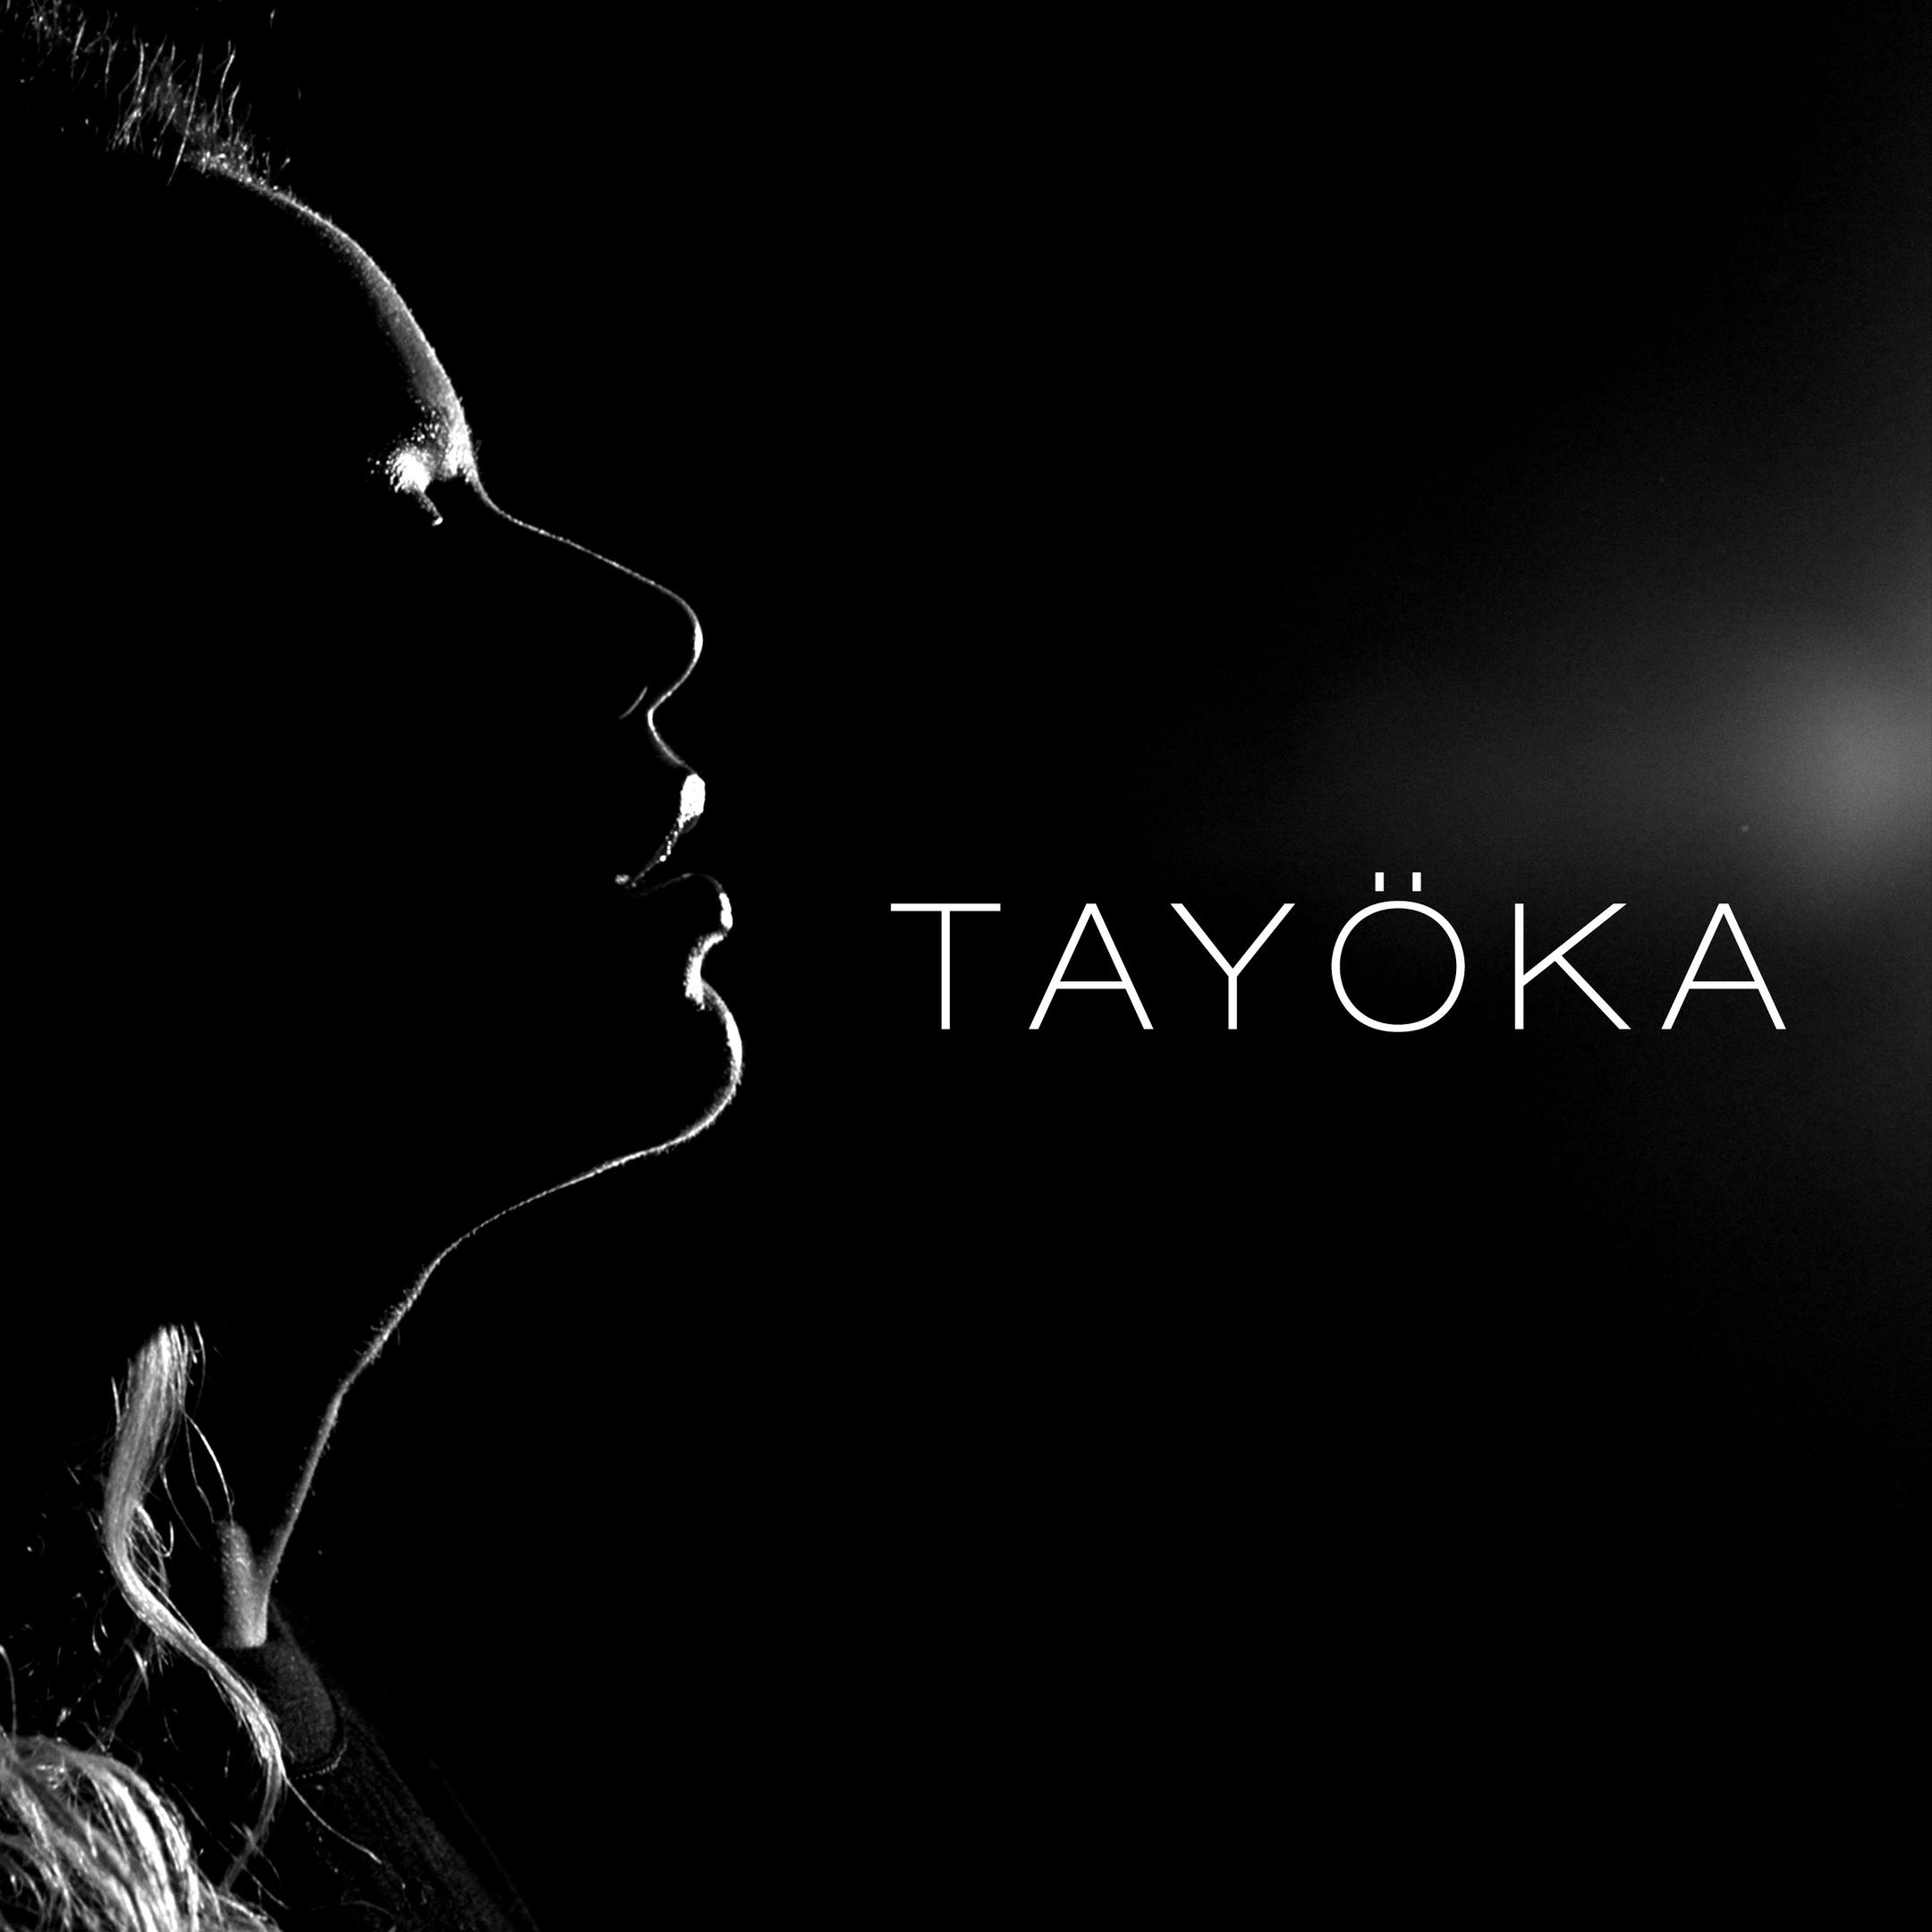 tayoka певица